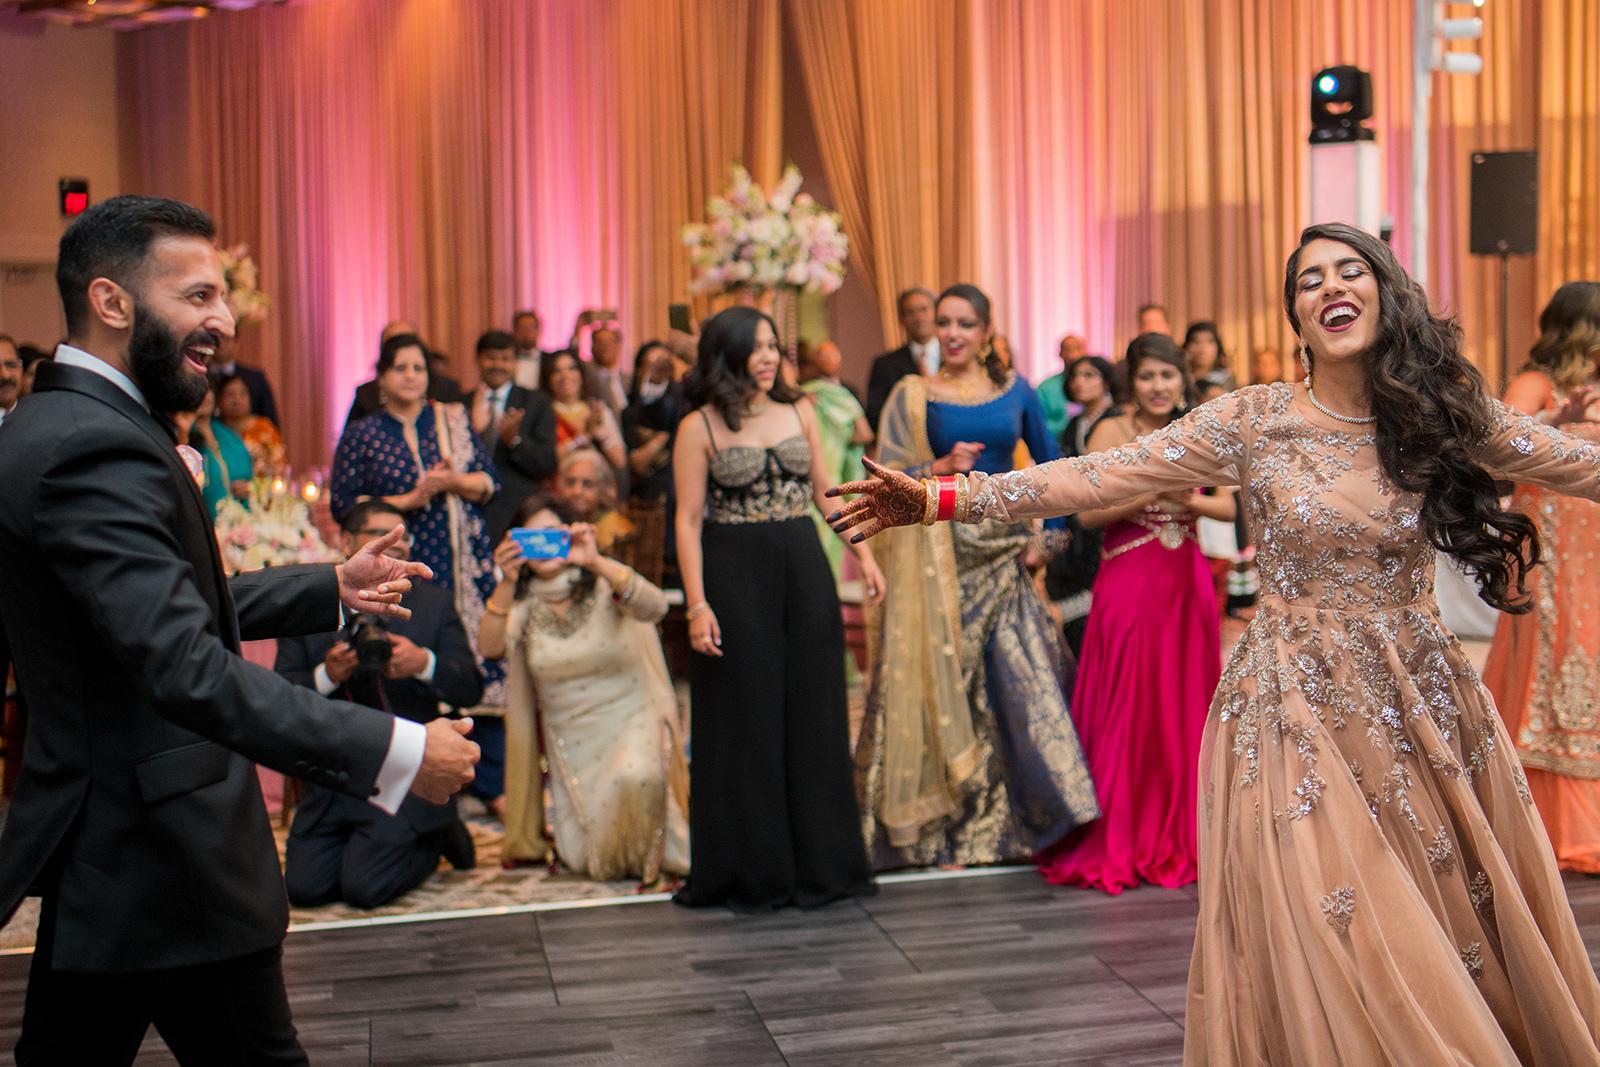 Le Cape Weddings - Sumeet and Chavi - Reception   -32.jpg